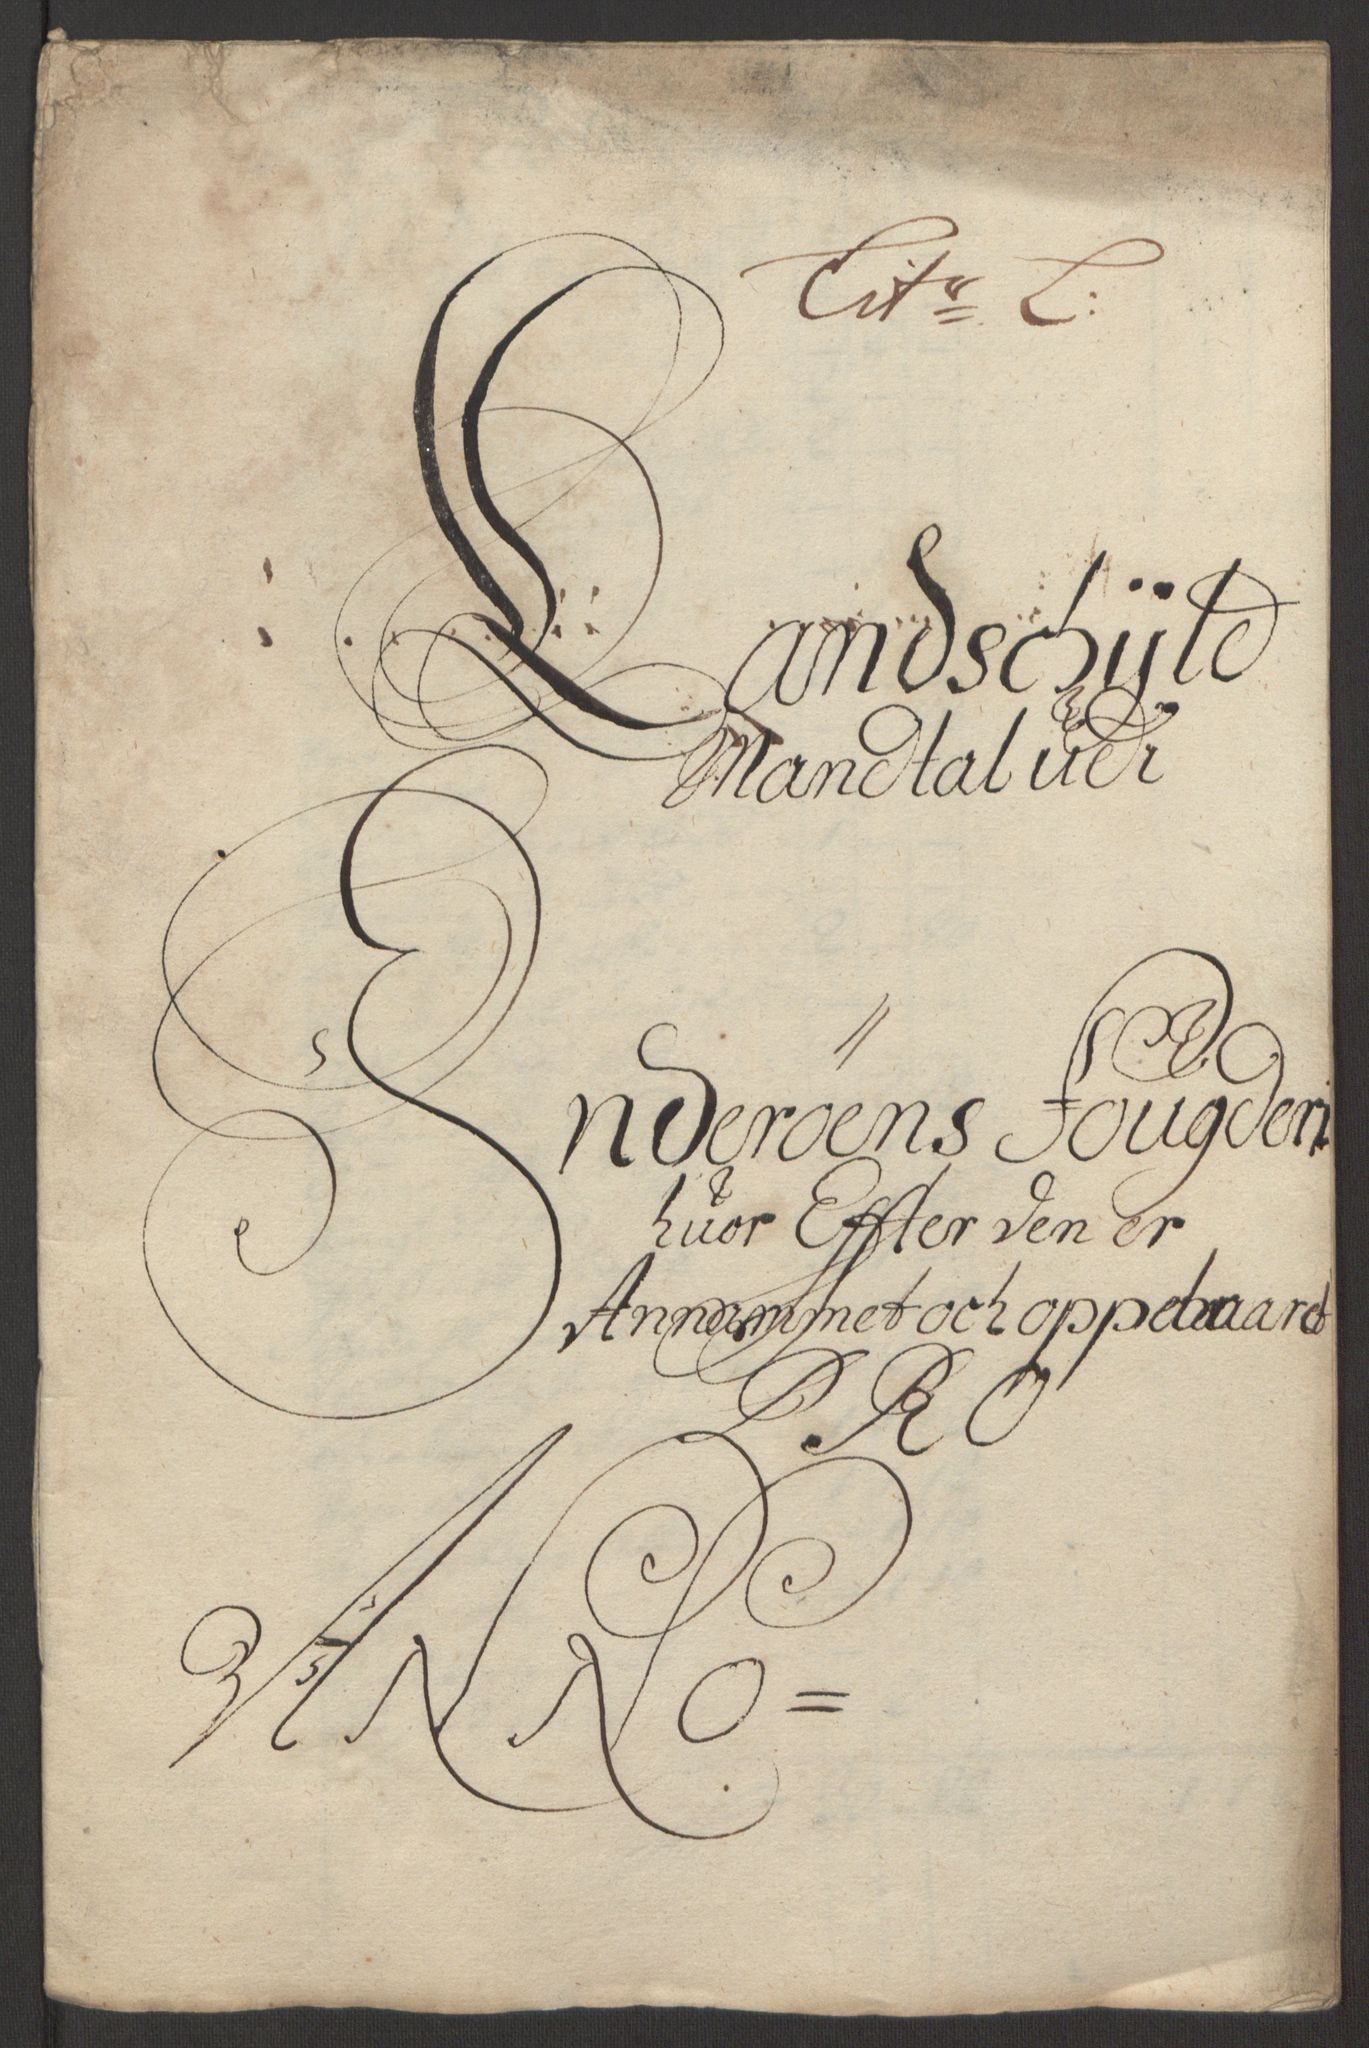 RA, Rentekammeret inntil 1814, Reviderte regnskaper, Fogderegnskap, R63/L4308: Fogderegnskap Inderøy, 1692-1694, s. 163